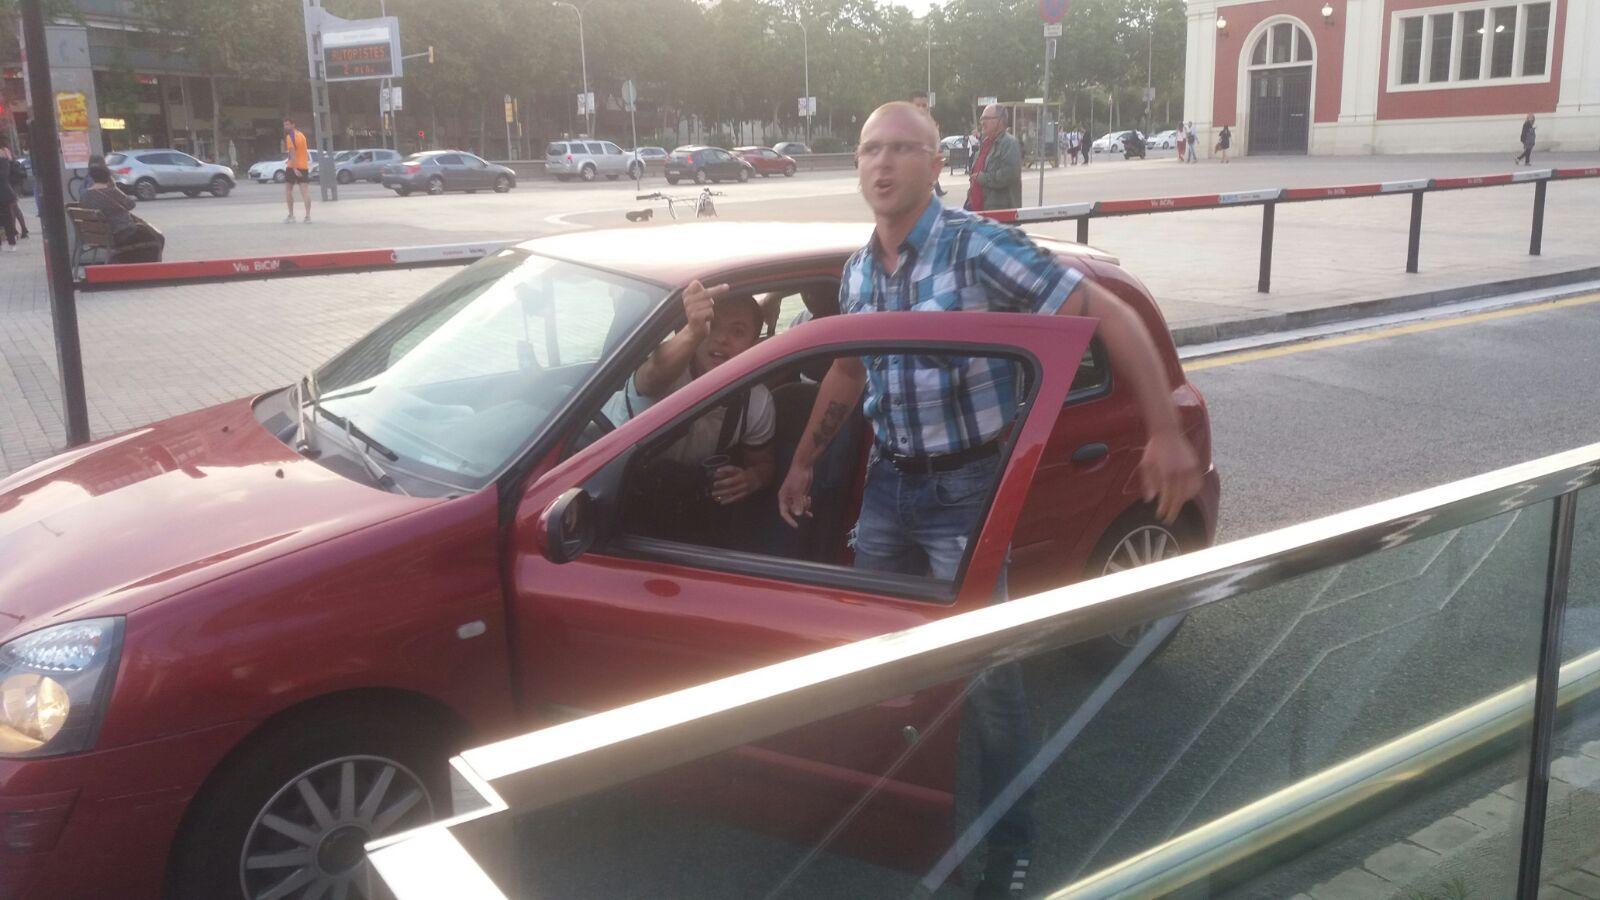 contactos prostitutas madrid solo hablan castellano prostitutas y delincuentes